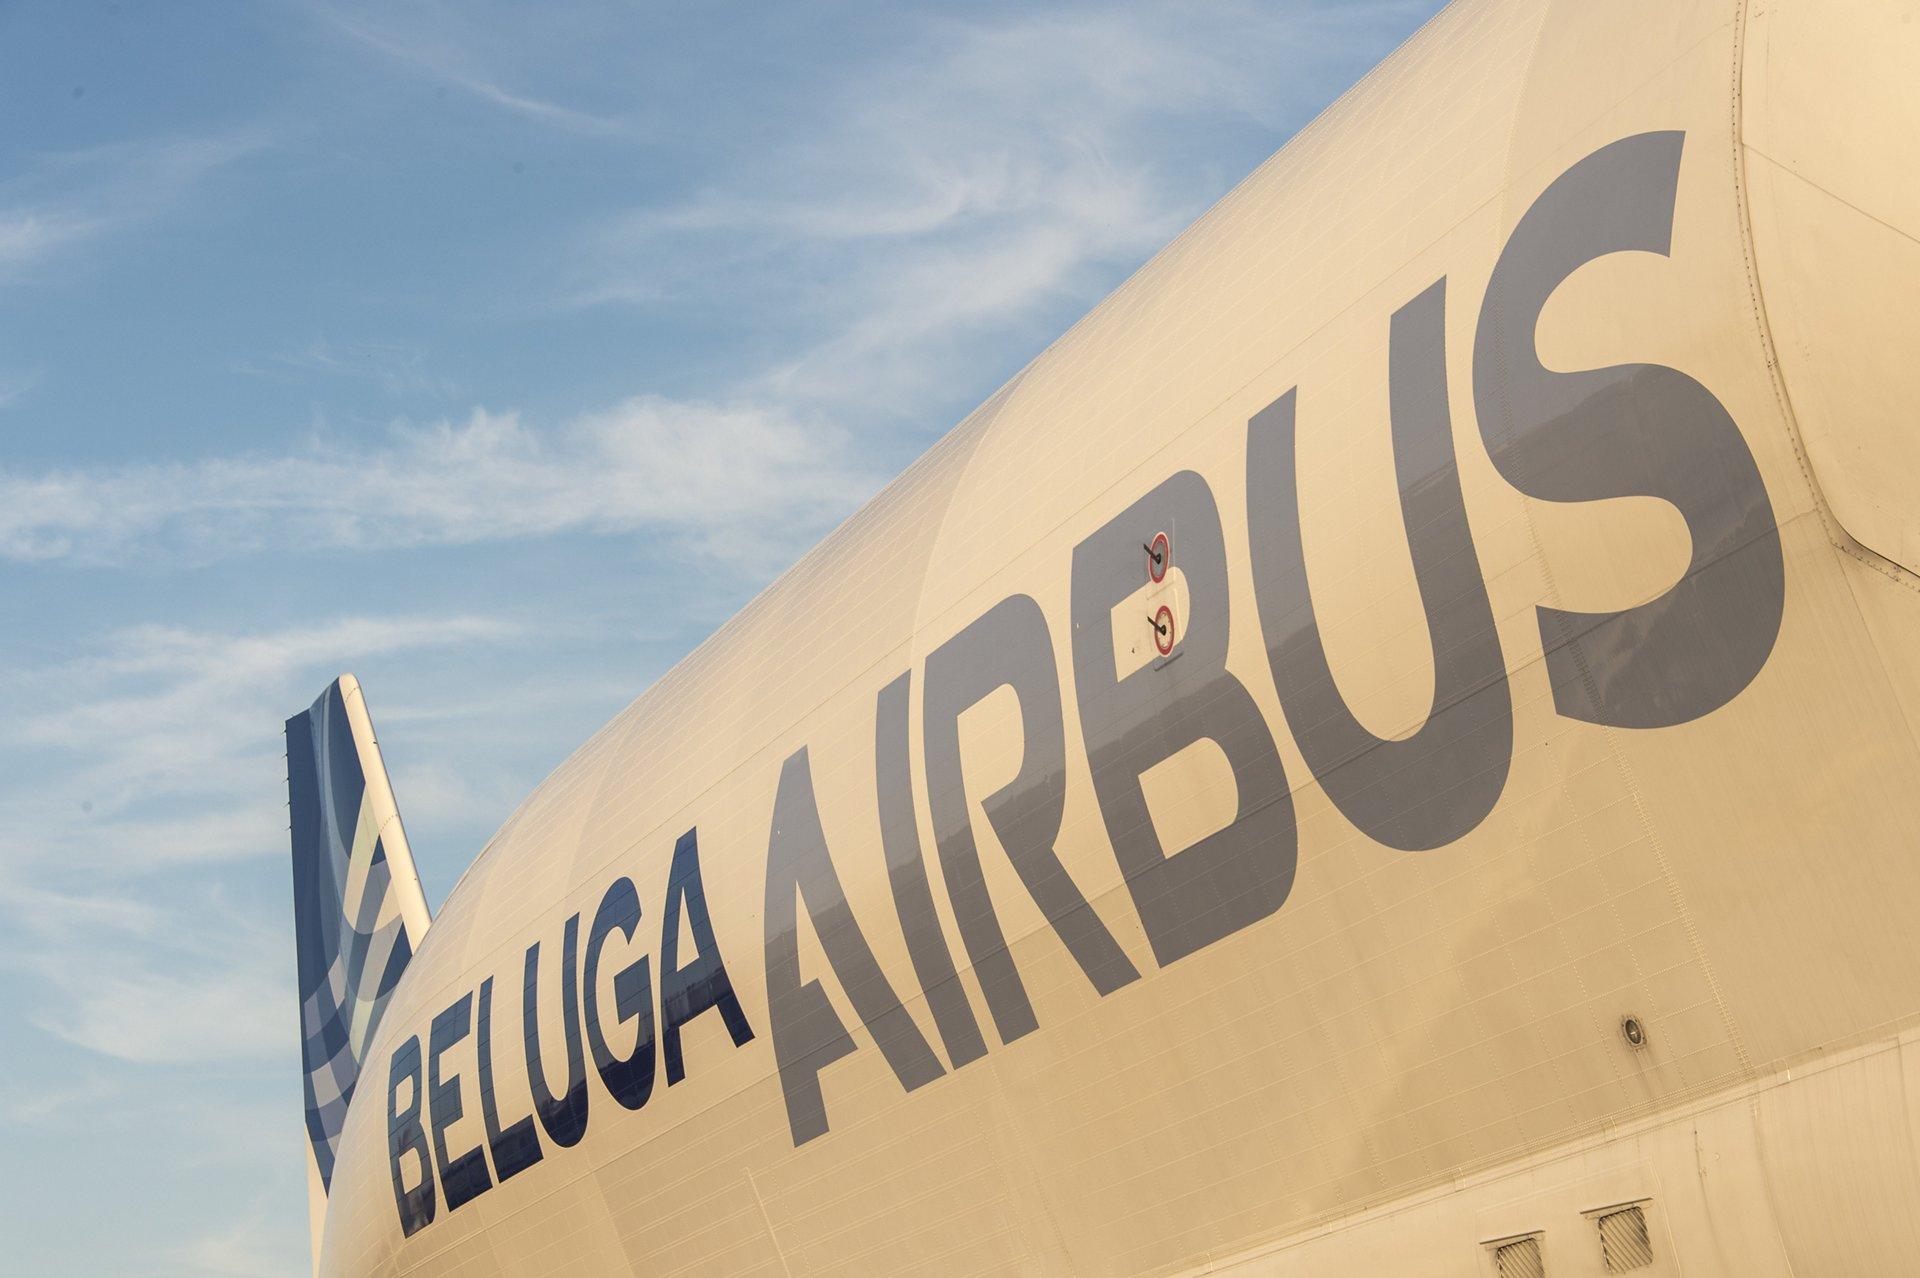 Airbus Beluga – Fuselage close-up 2